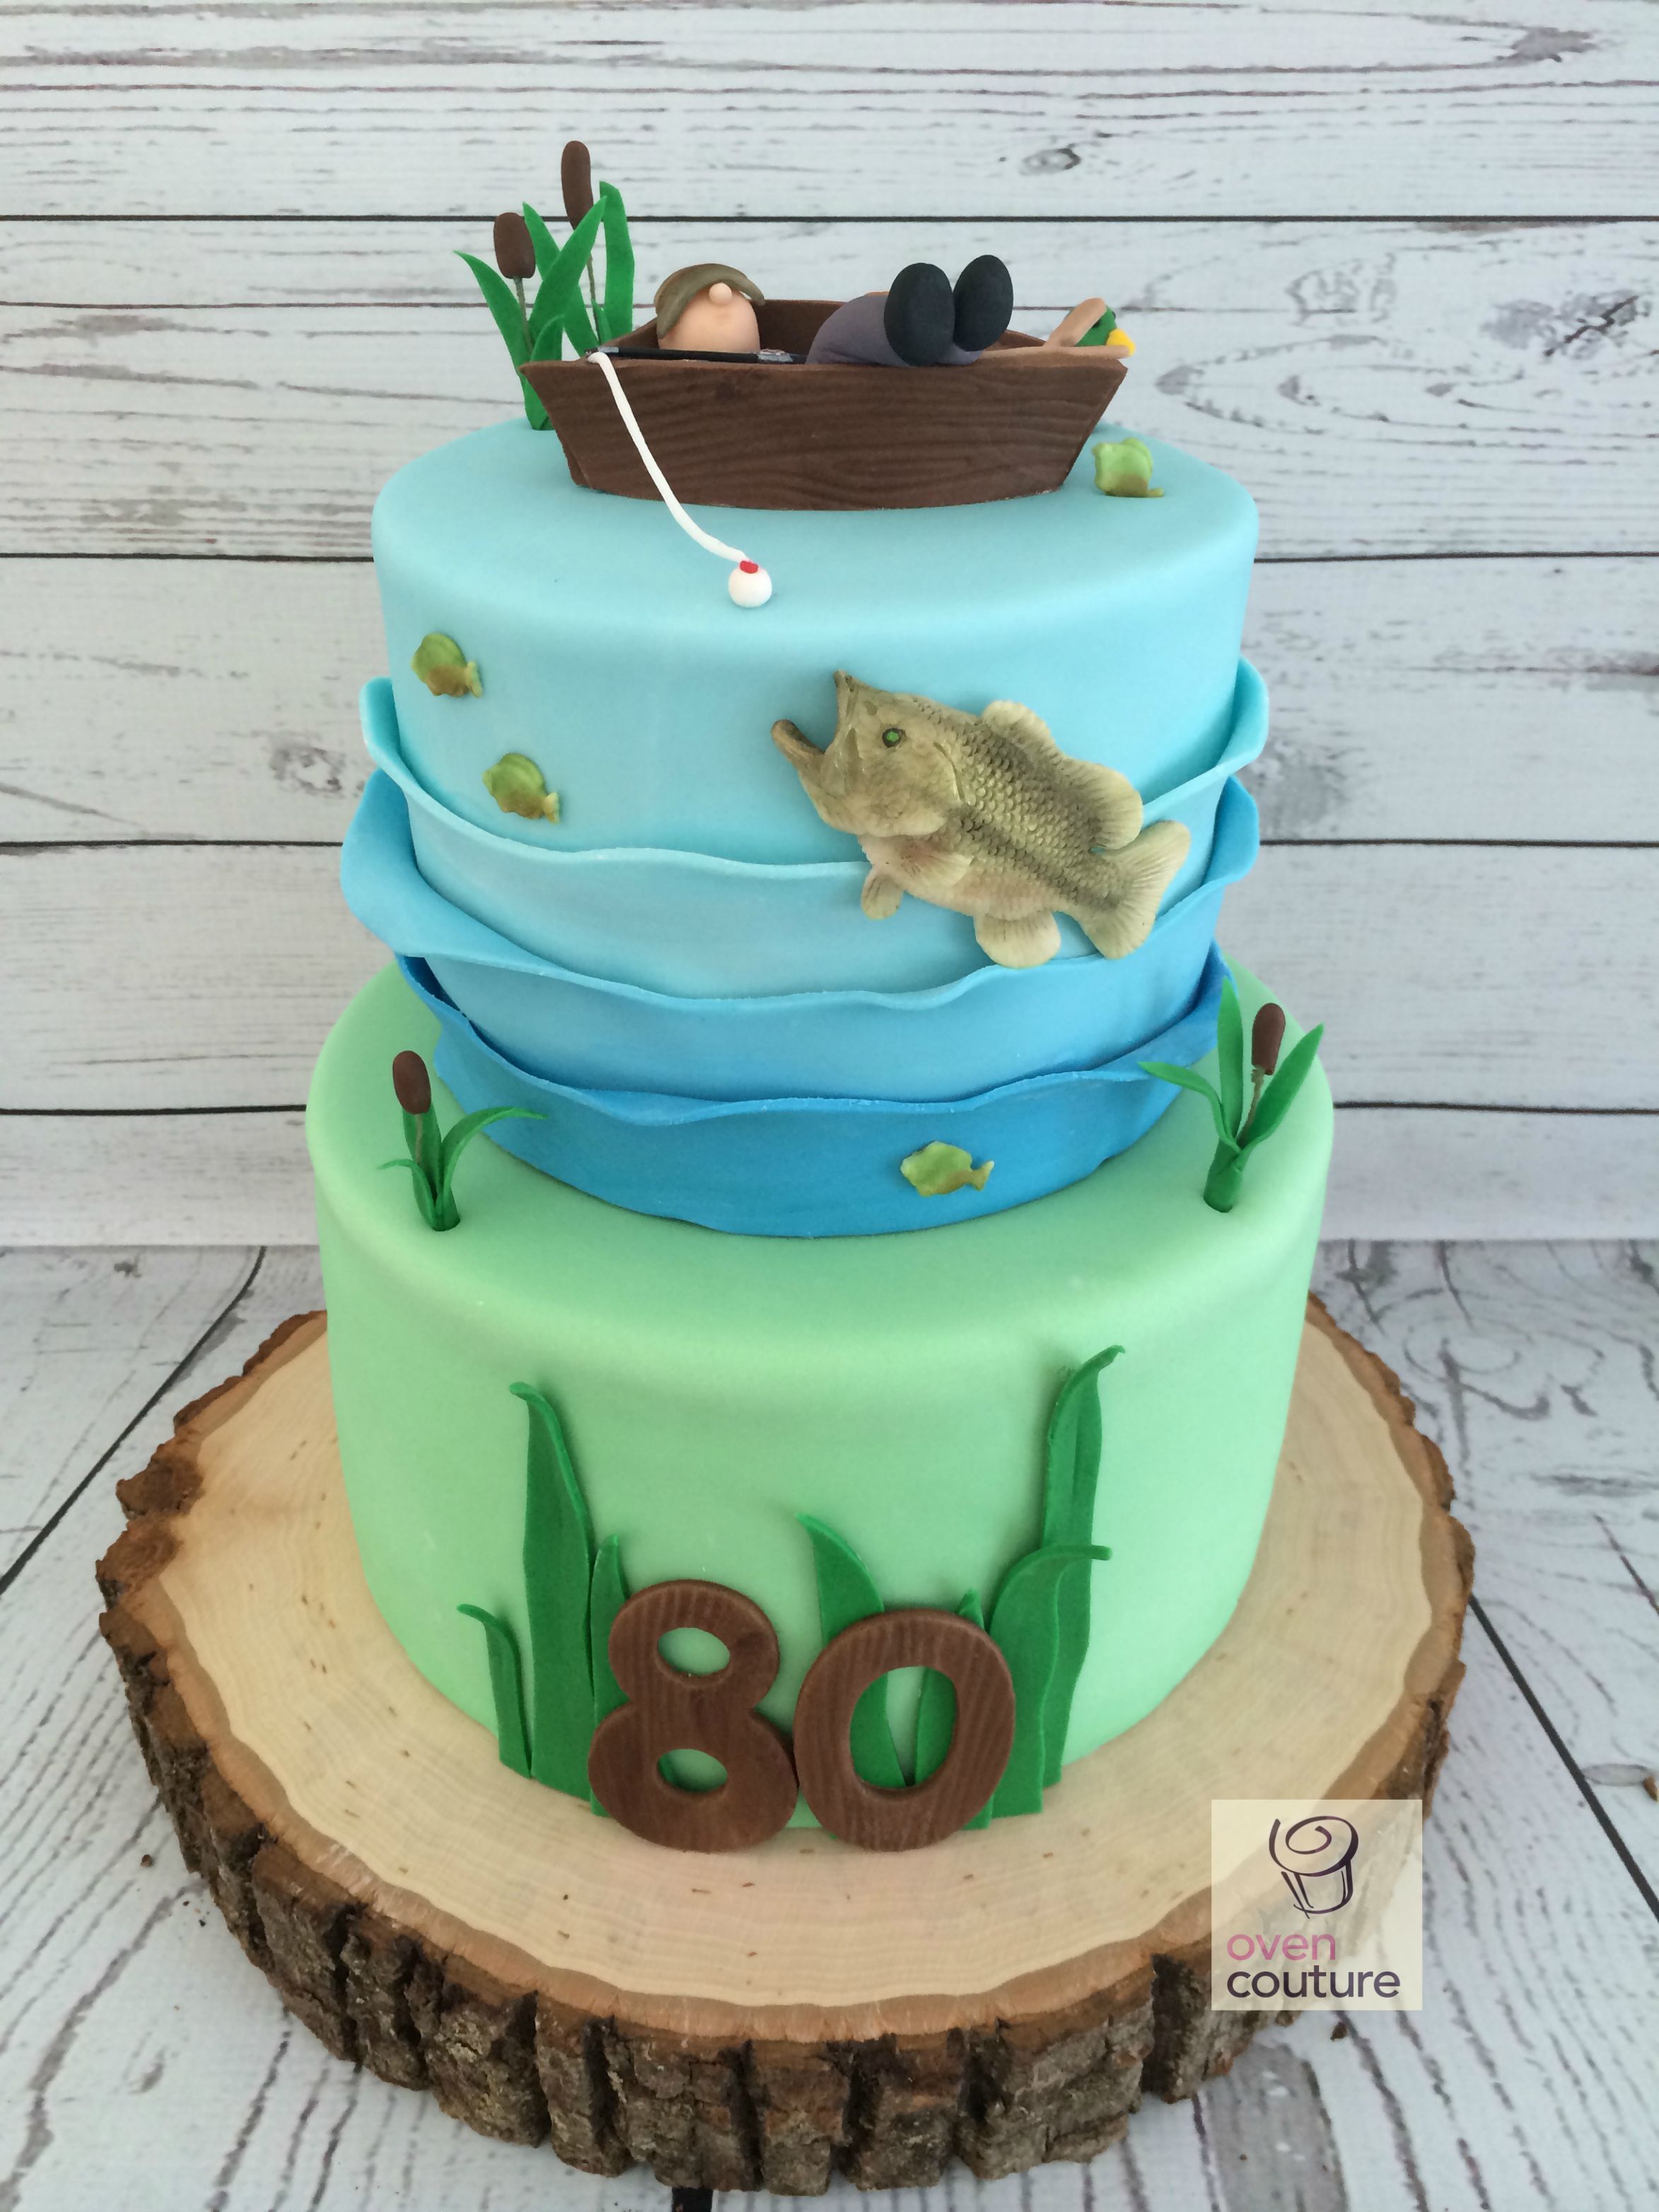 Fishing bass cake for 80th birthday for Fishing birthday cake